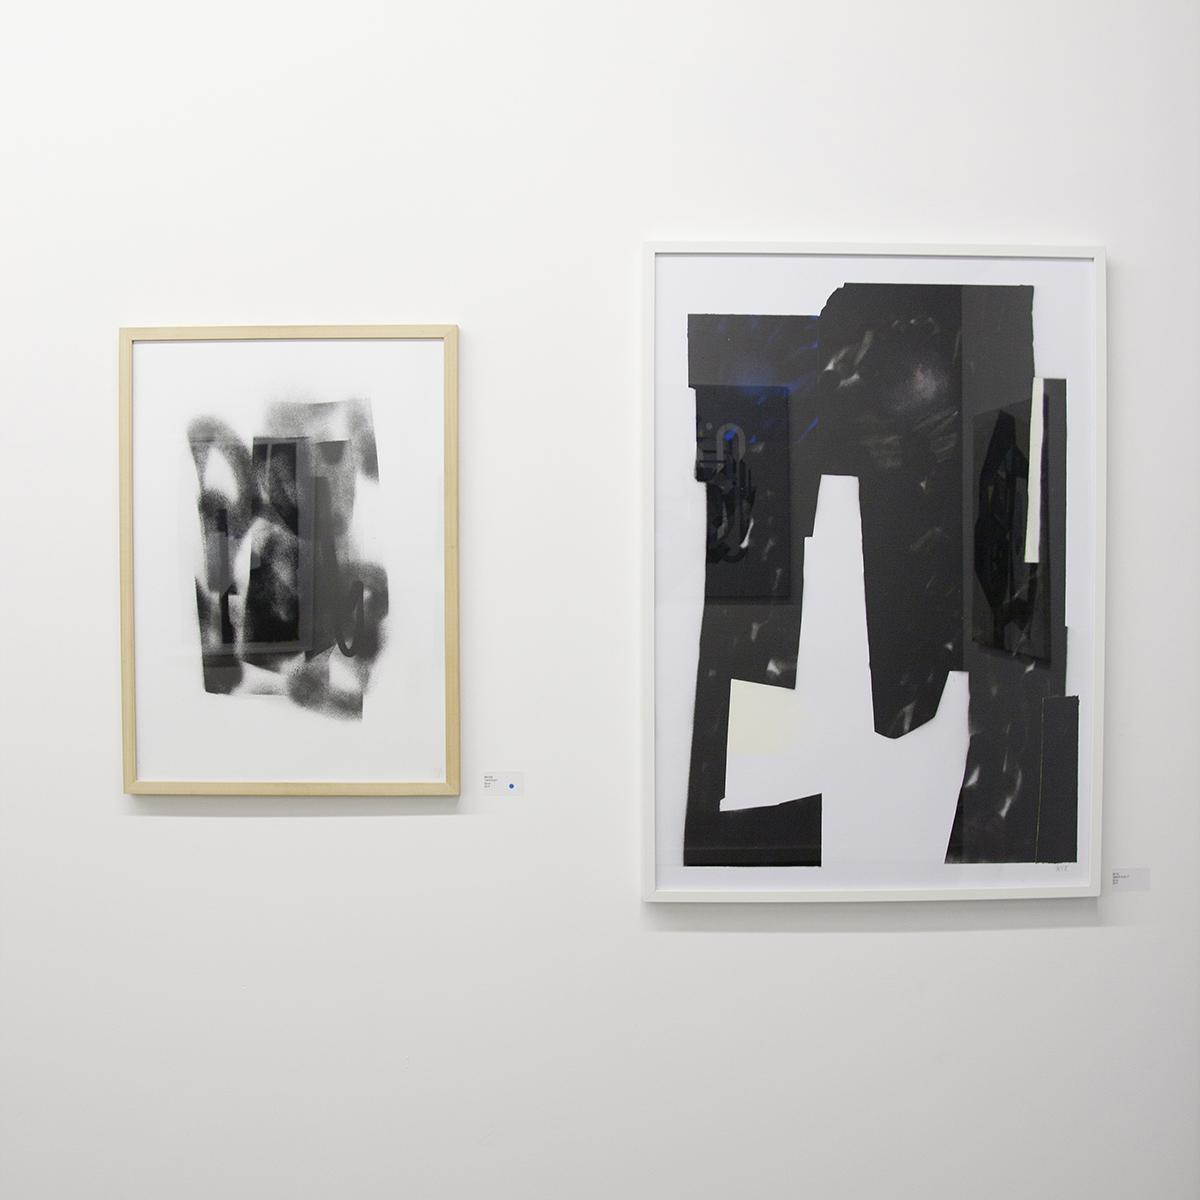 108-ekta-erosie-nelio-at-galerie-slika-recap-18